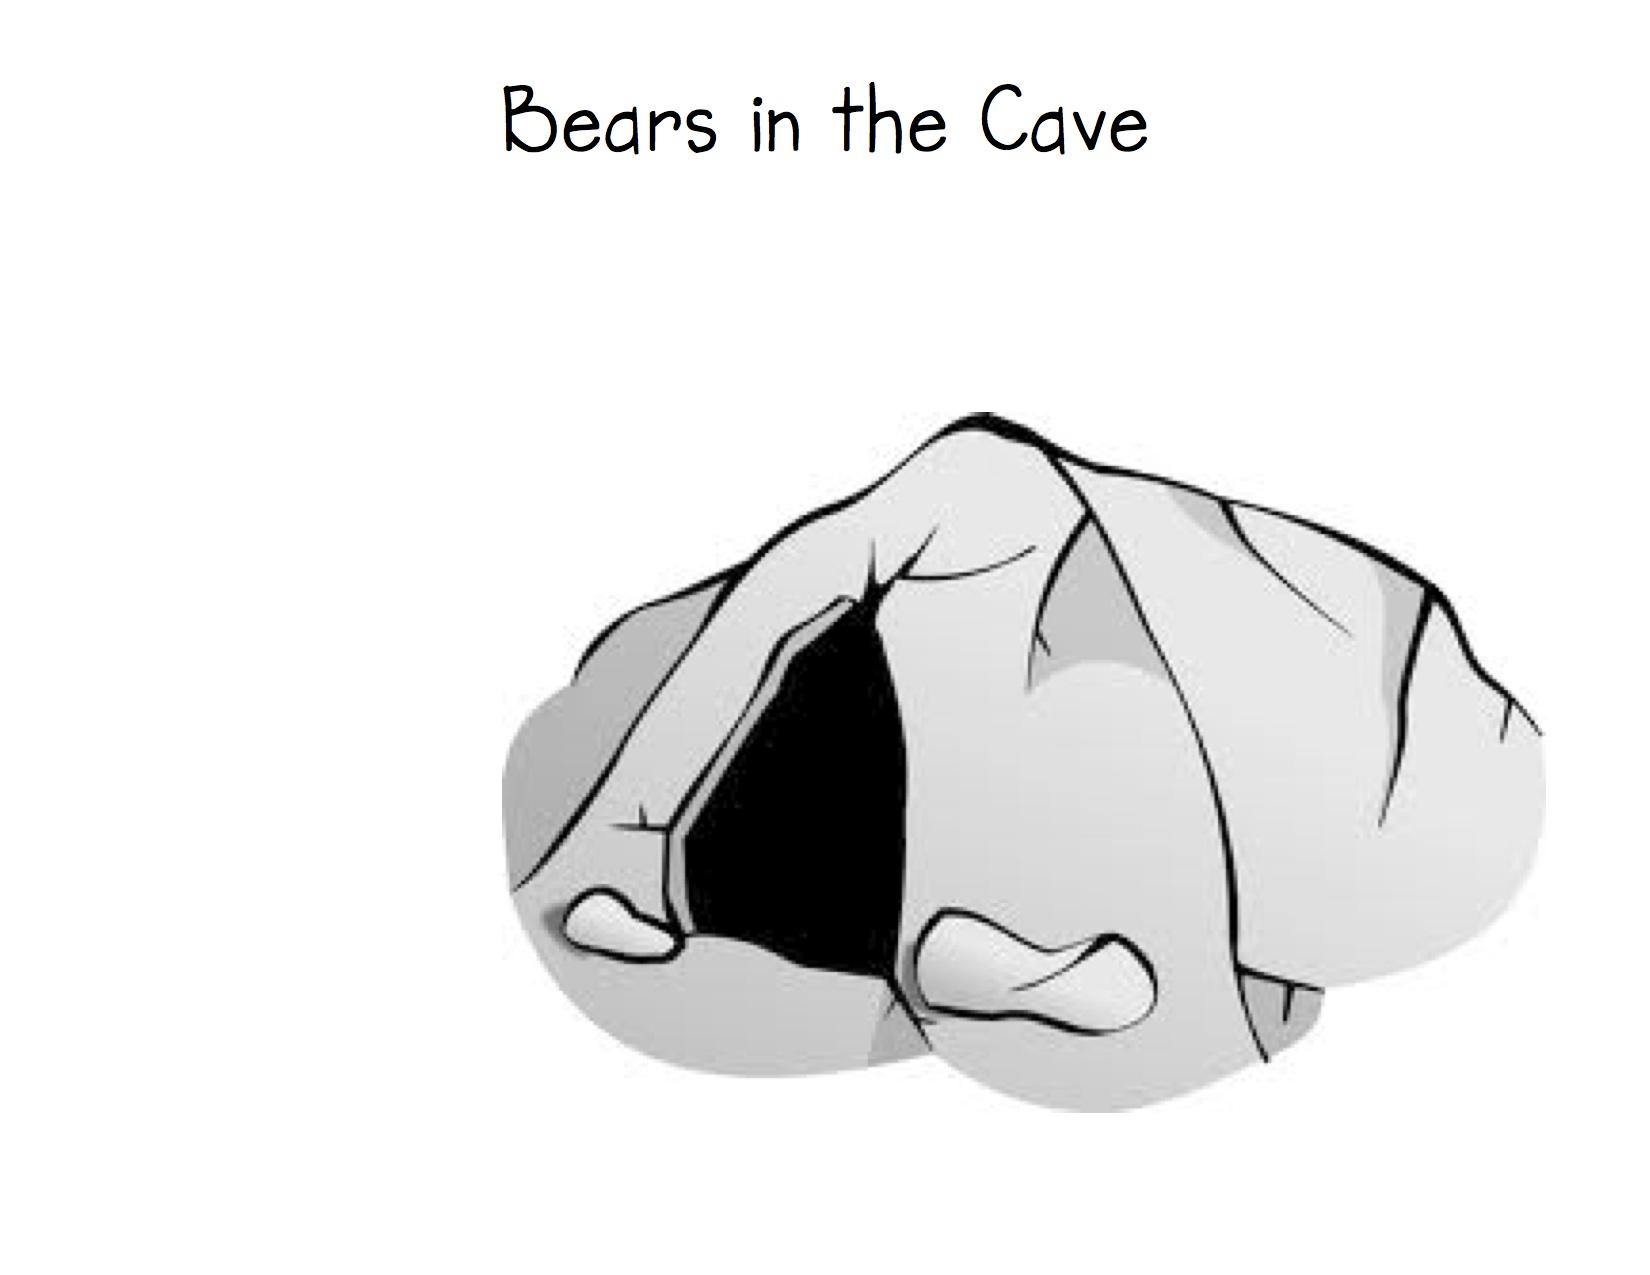 Drawn cavern vector Entrance clipart Clip Savoronmorehead Cave